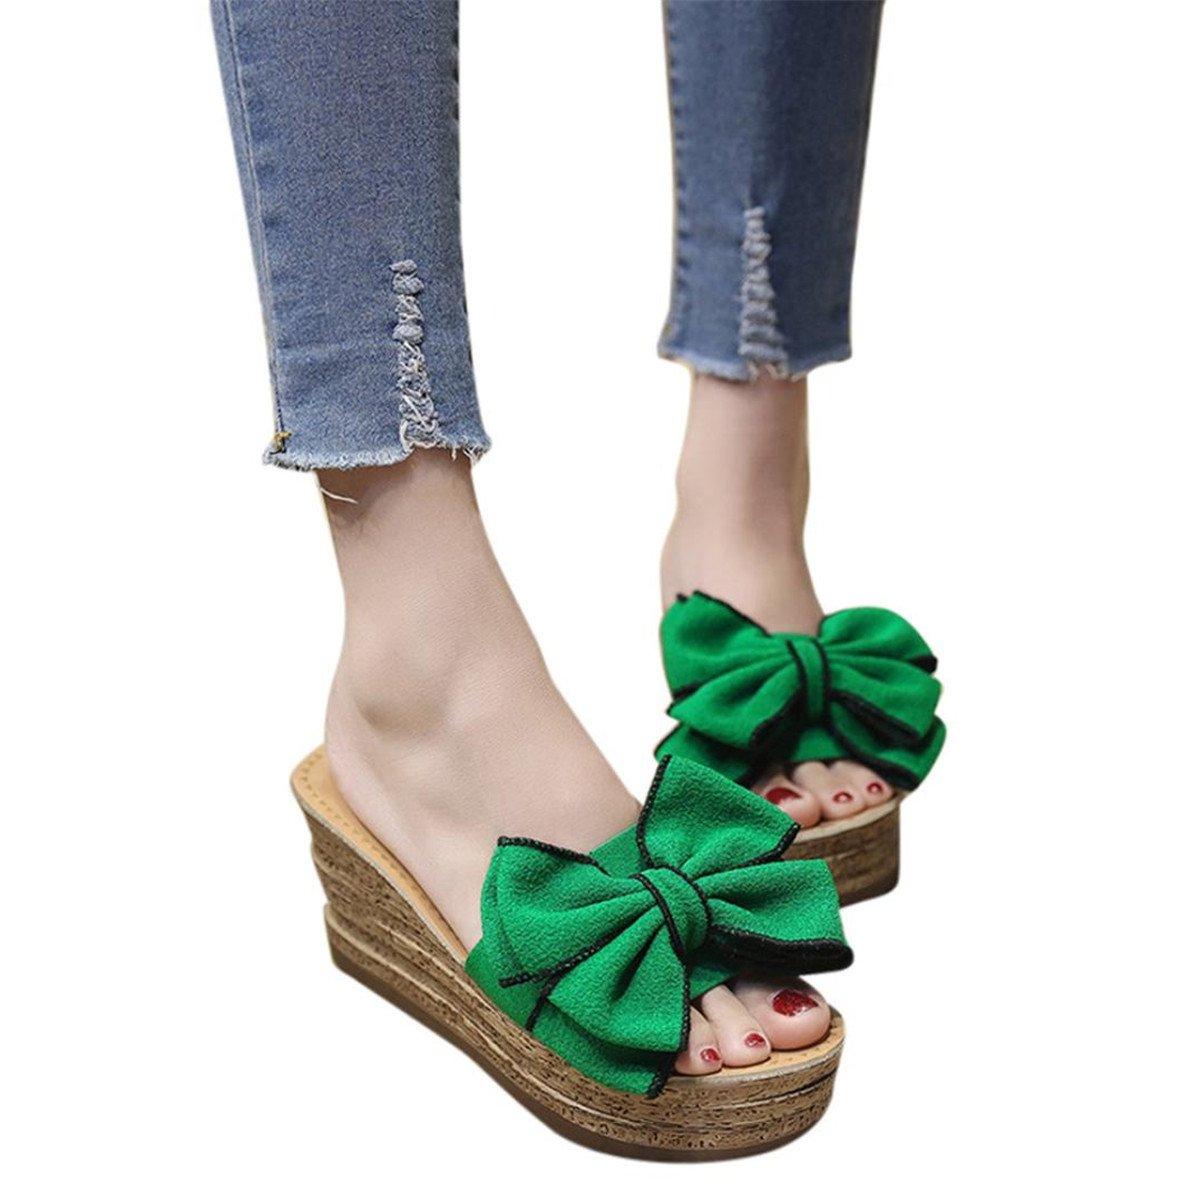 KESEELY Fashional Hight Heels Slipper Women Bow Wedges Slipper Sandals Kitten Heels Shoes For Summer (US:8.5, Green)